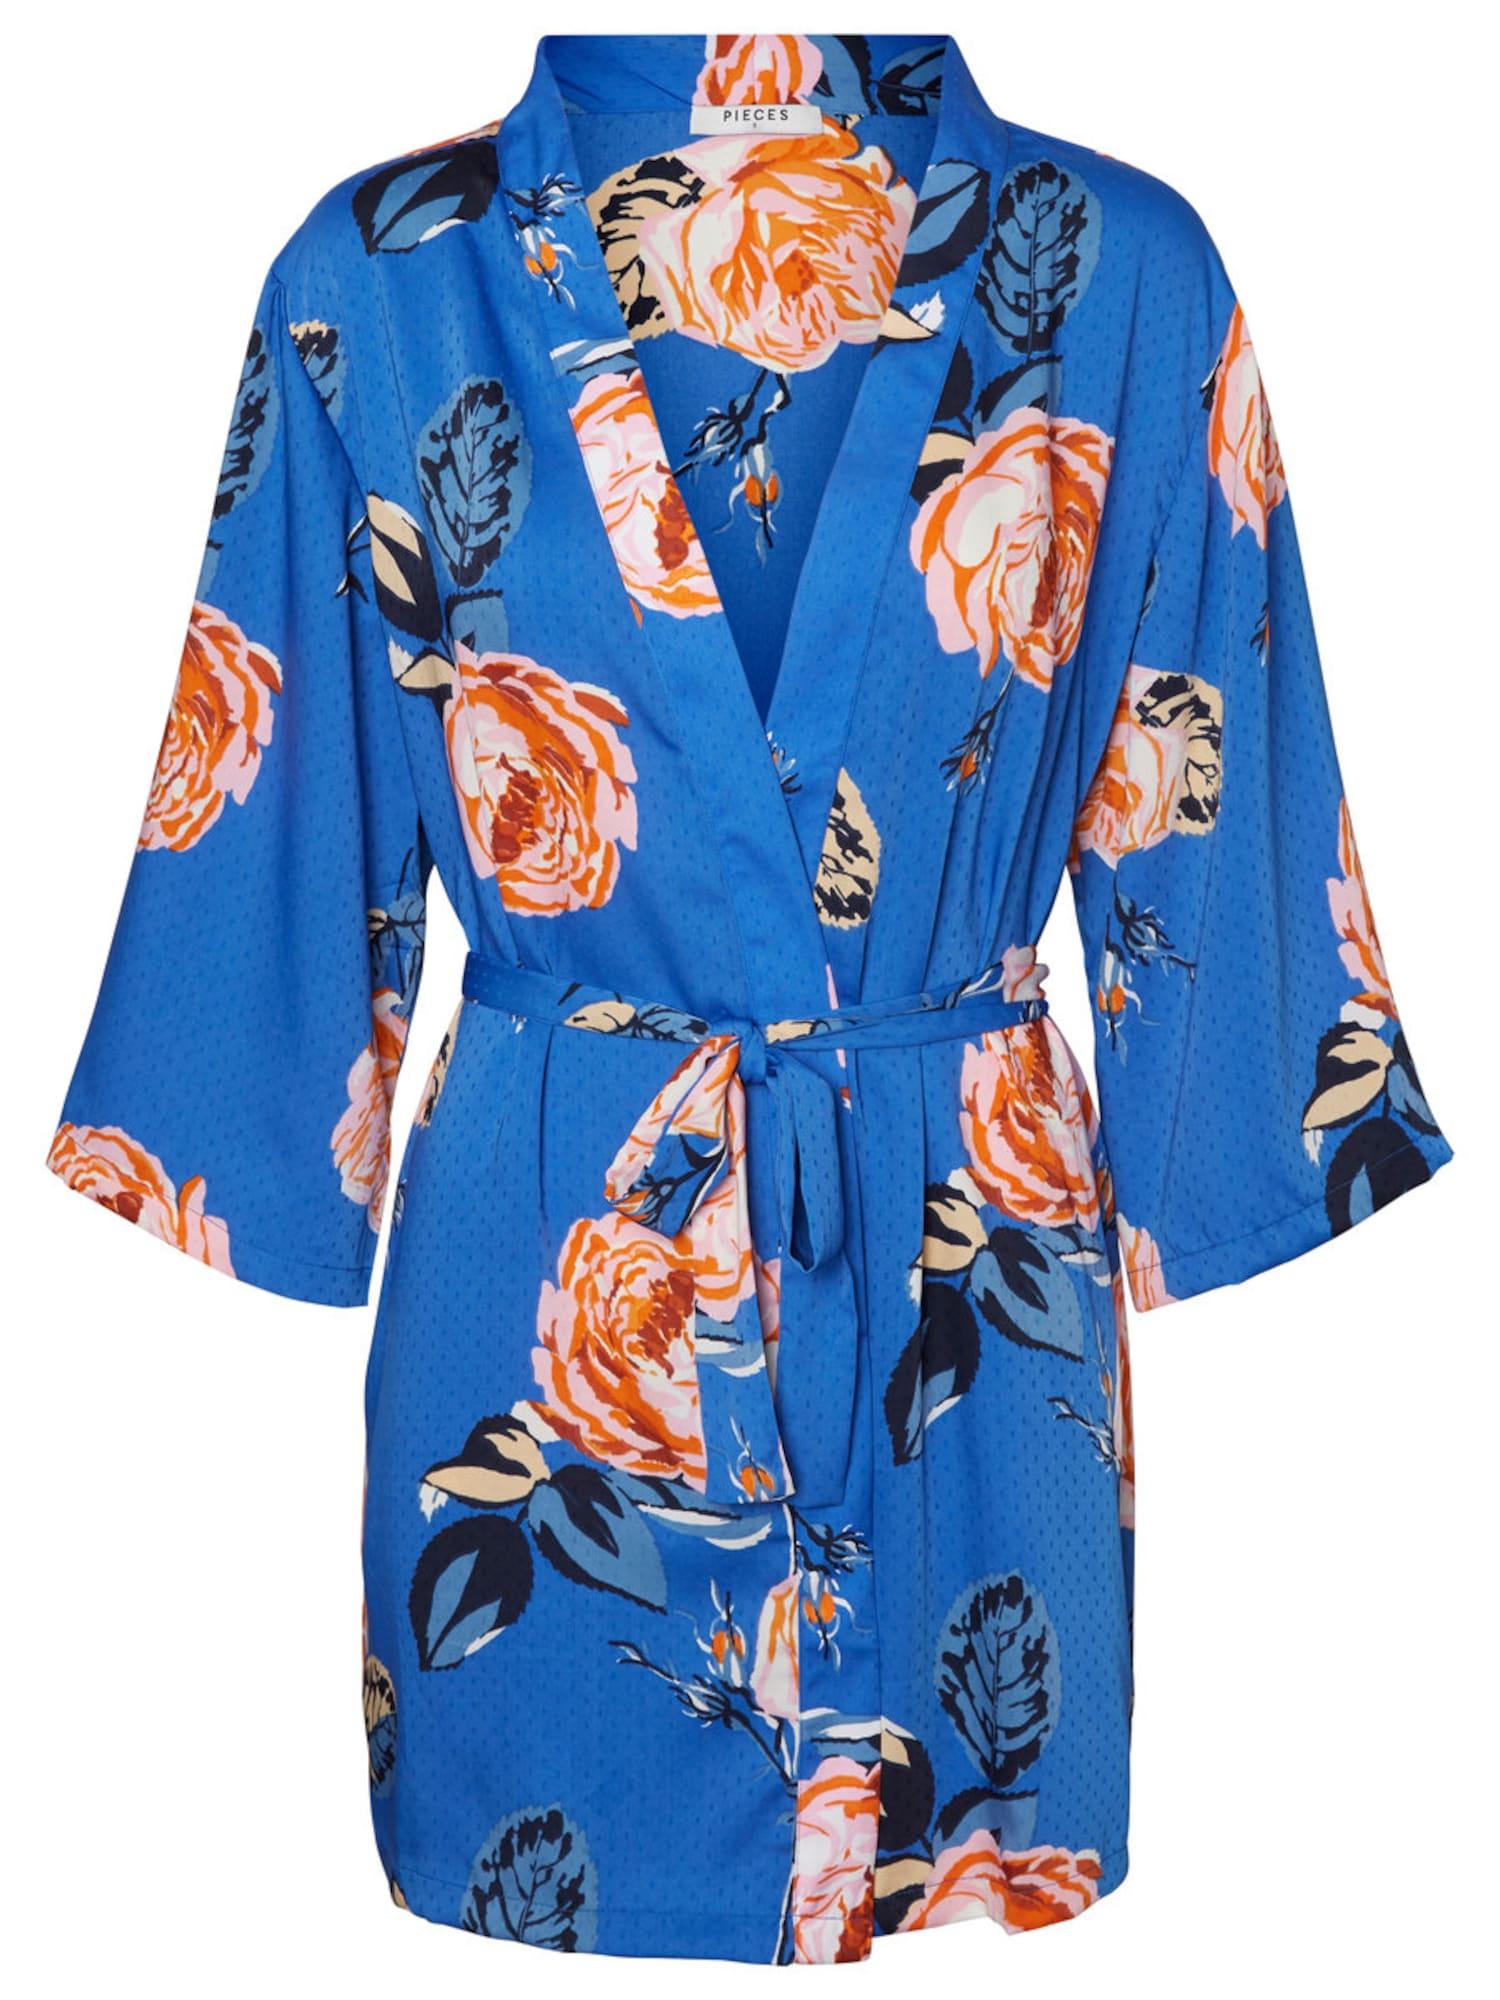 PIECES, Dames Kimono, blauw / sinaasappel